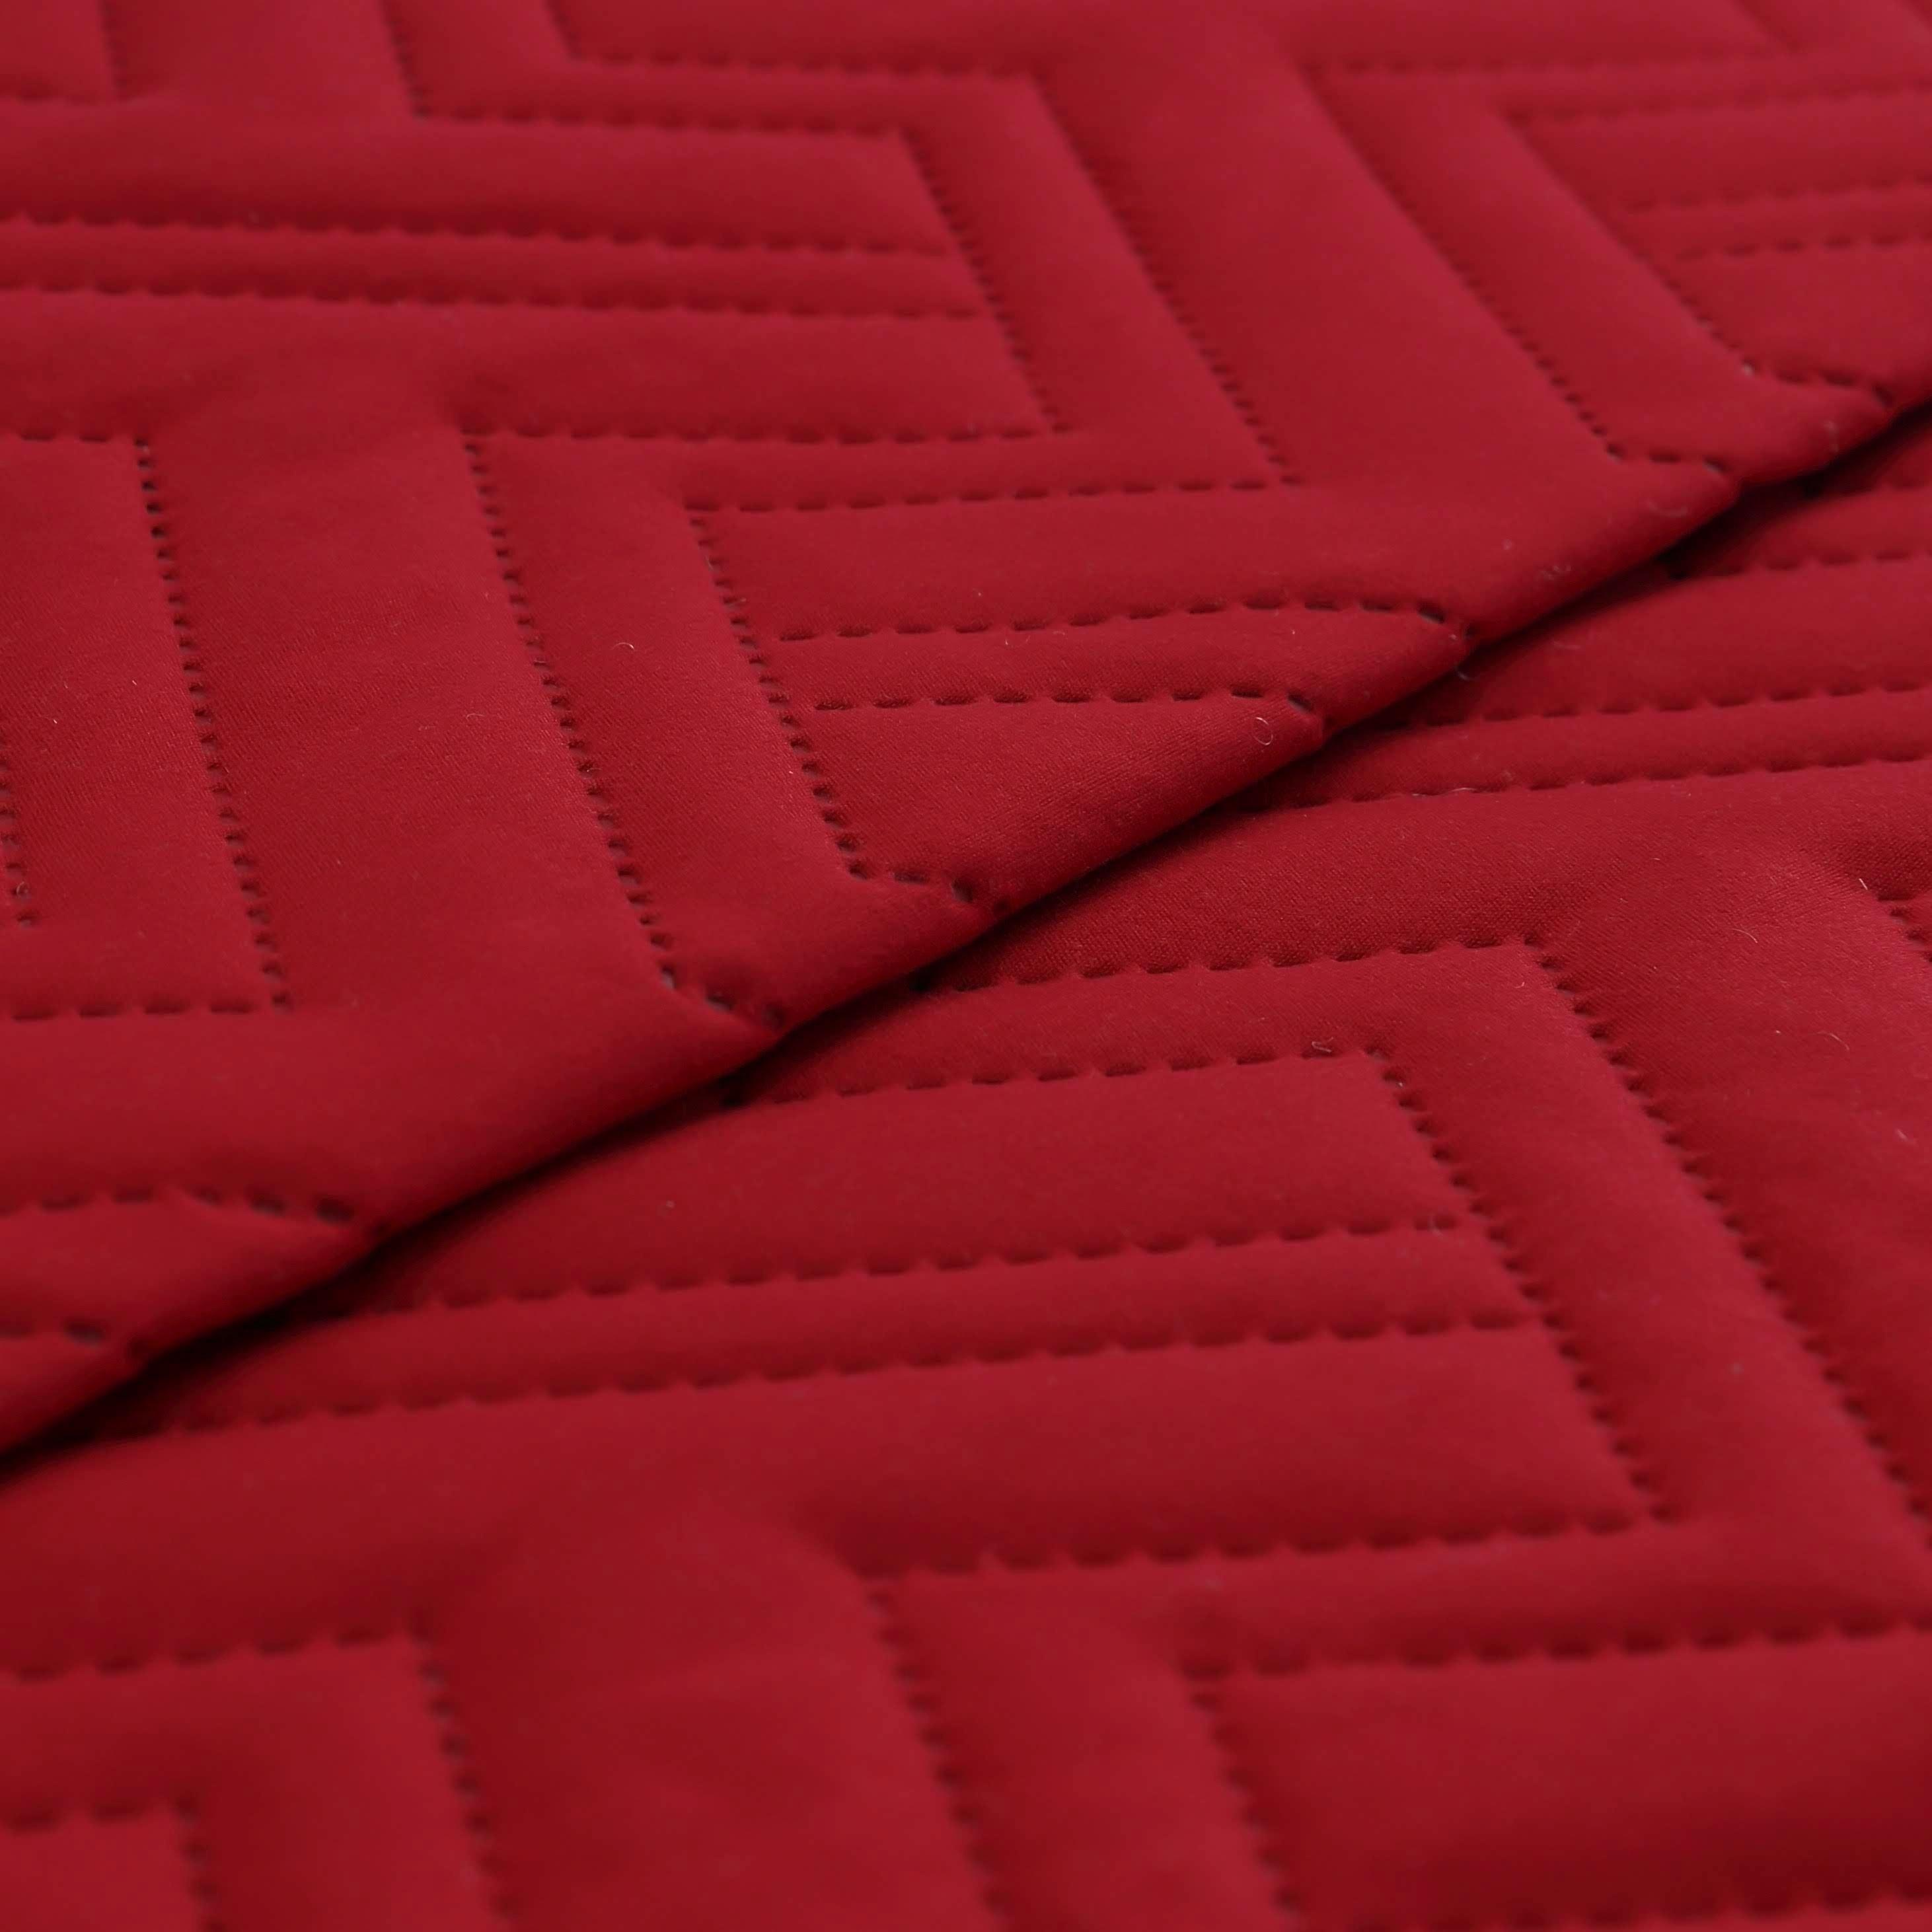 Microfiber Oversized King Size Quilt Super soft Burgundy Embroidered Quilt